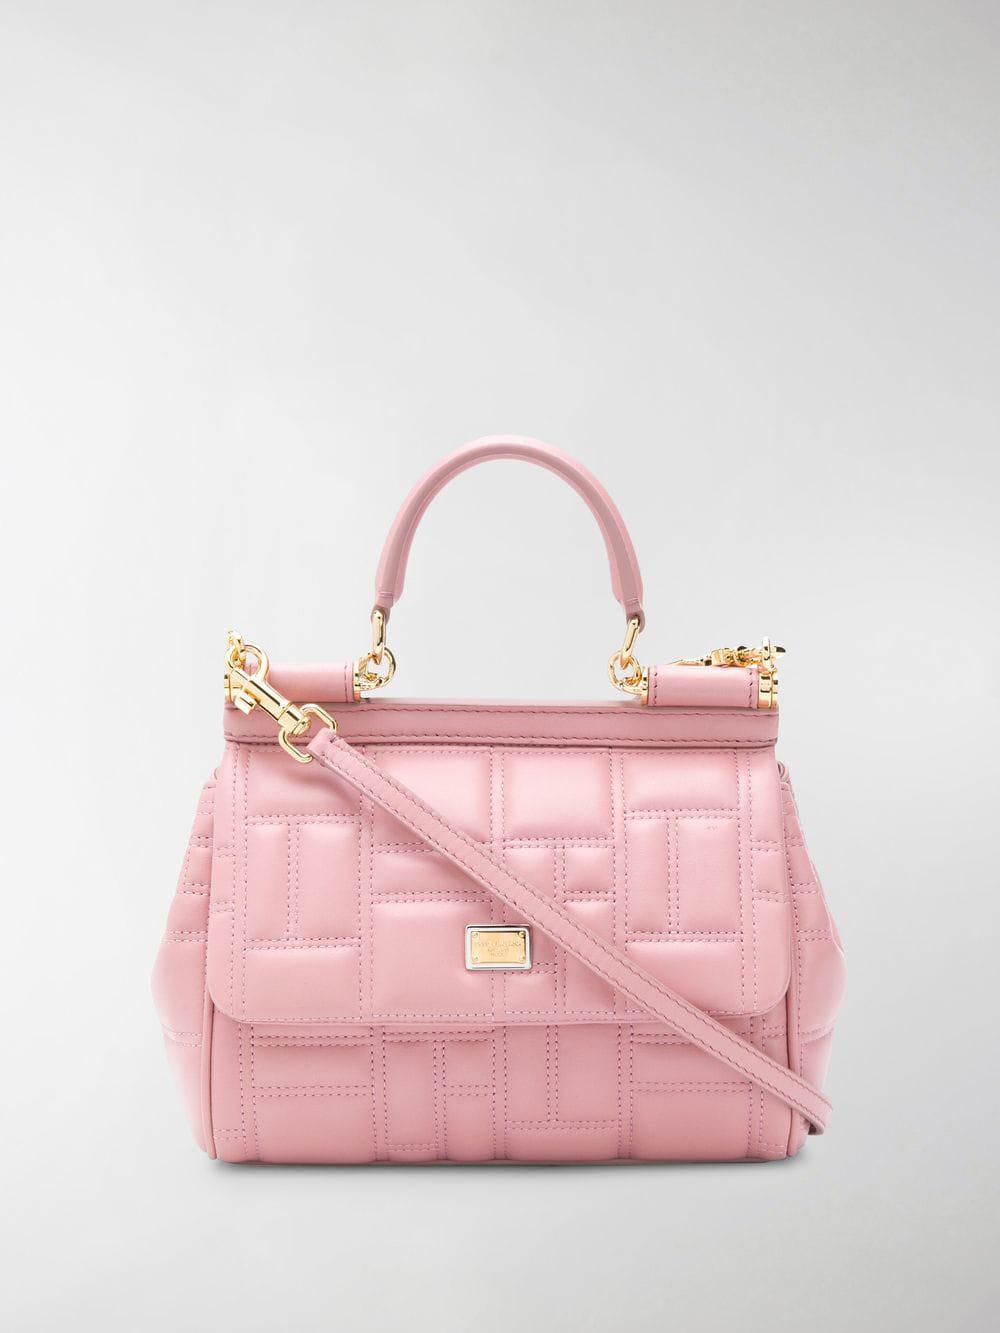 9fc4fcda53 Lyst - Dolce   Gabbana Sicily Tote Bag in Pink